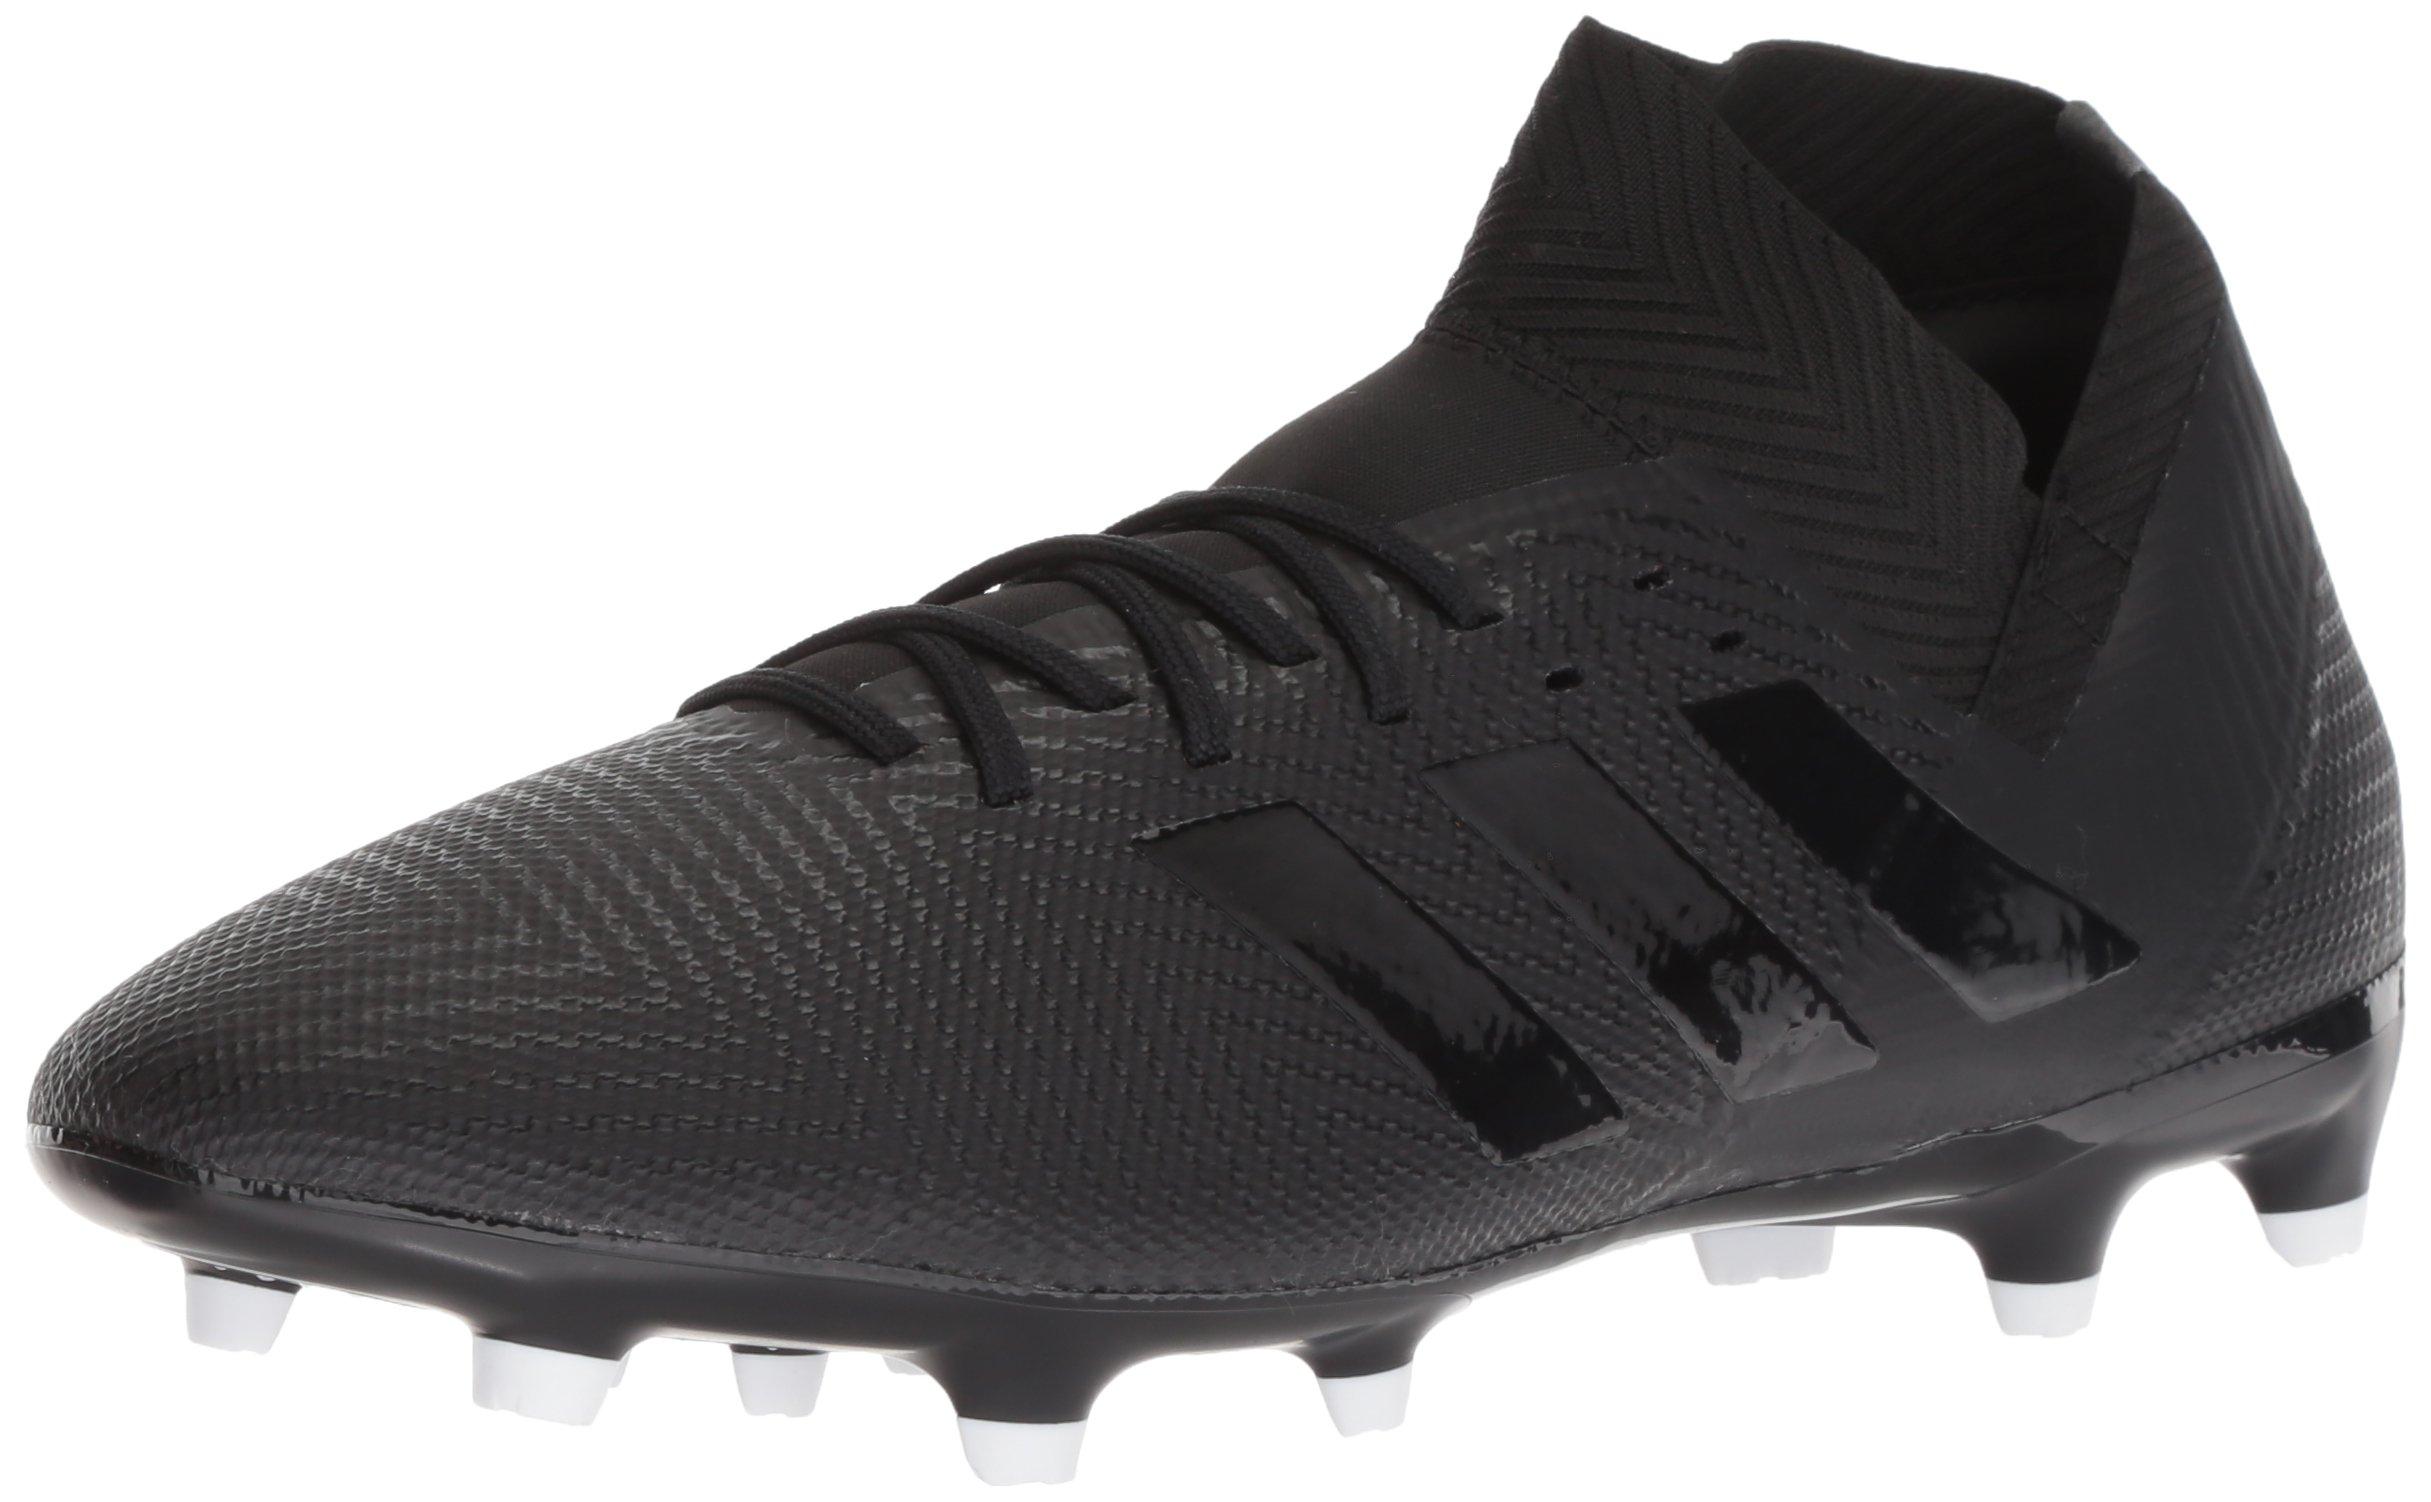 adidas Men's Nemeziz 18.3 Firm Ground Soccer Shoe, Black/Black/White, 8.5 M US by adidas